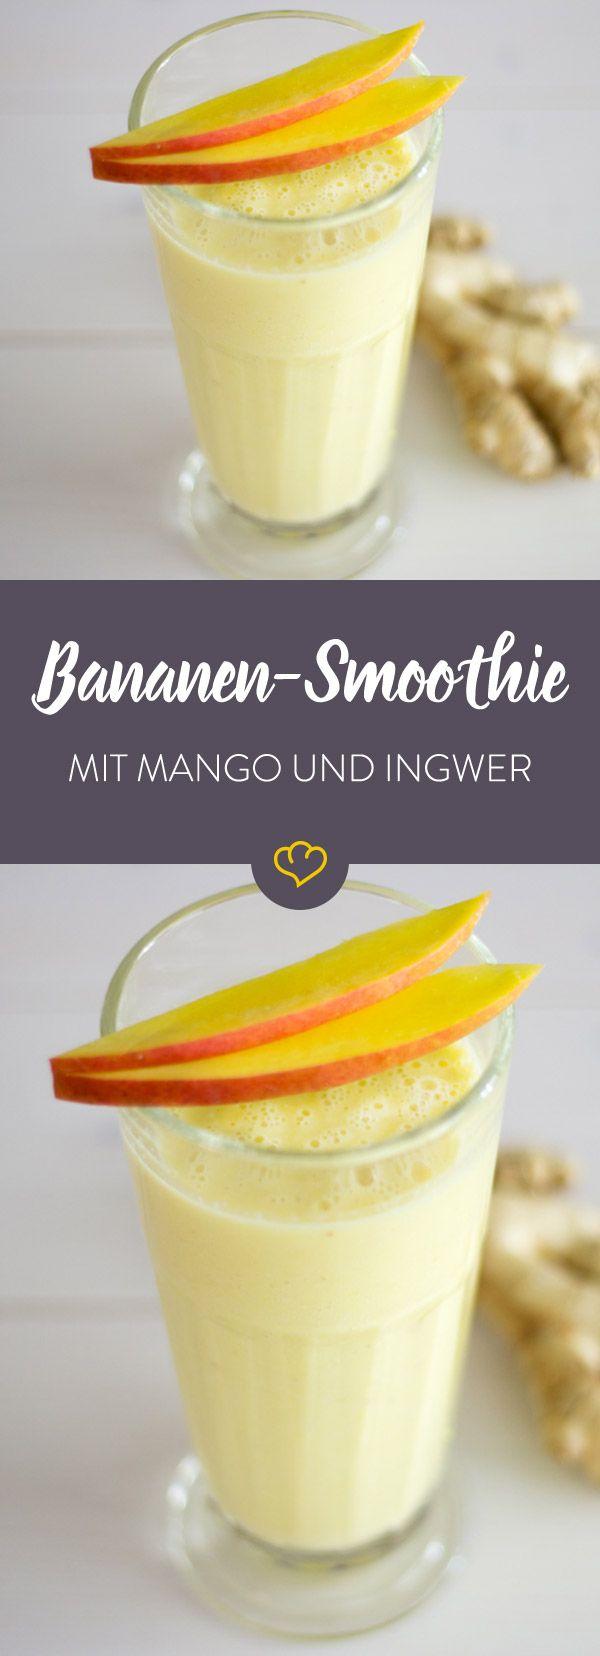 Mango-Banane-Ingwer-Smoothie #bestgincocktails